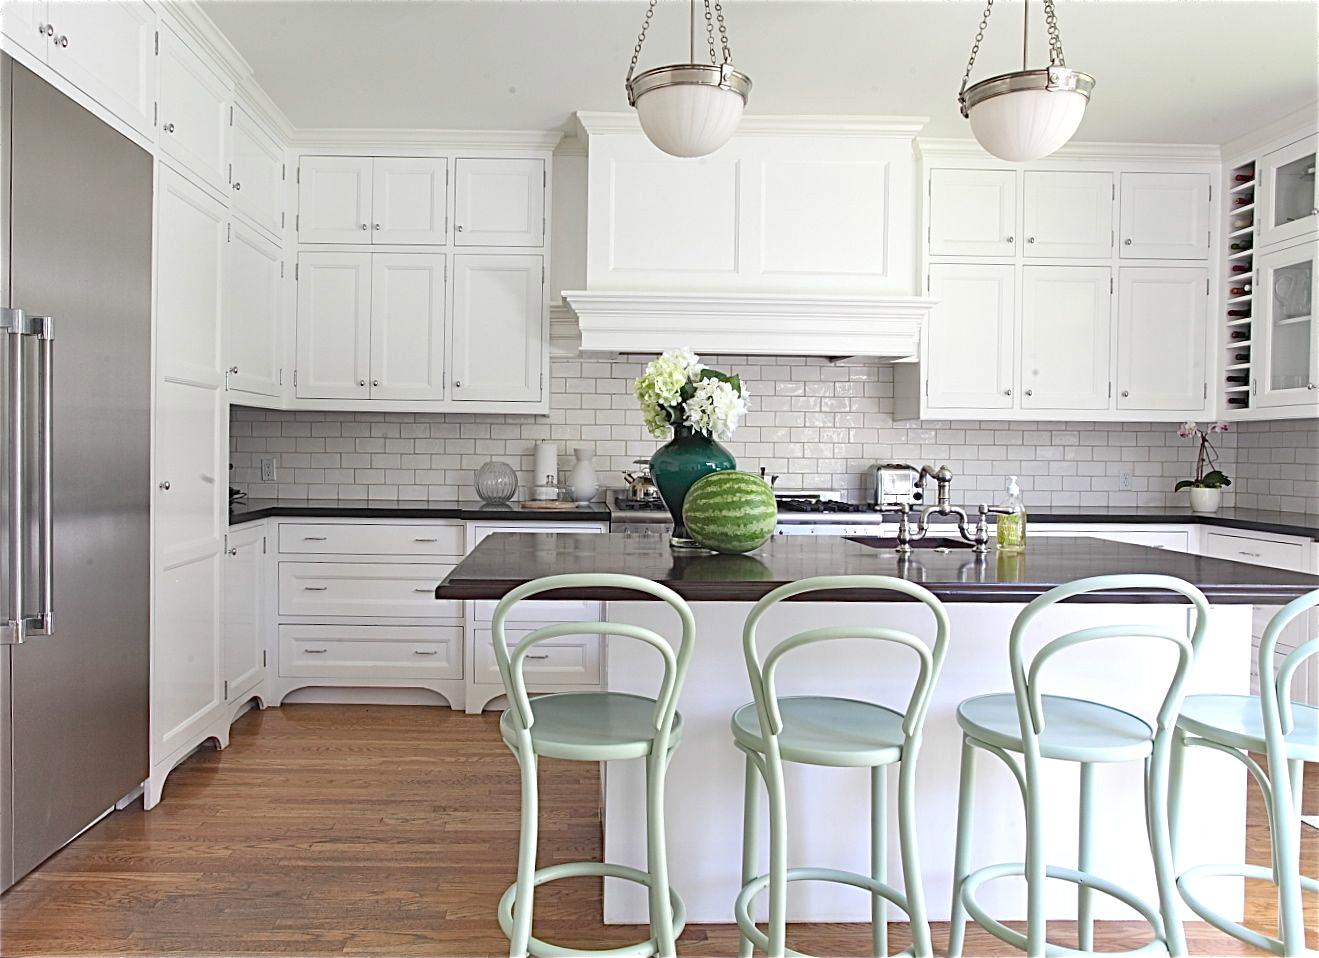 Funky Rosa Kitchen Photo - Kitchen Cabinets | Ideas & Inspiration ...